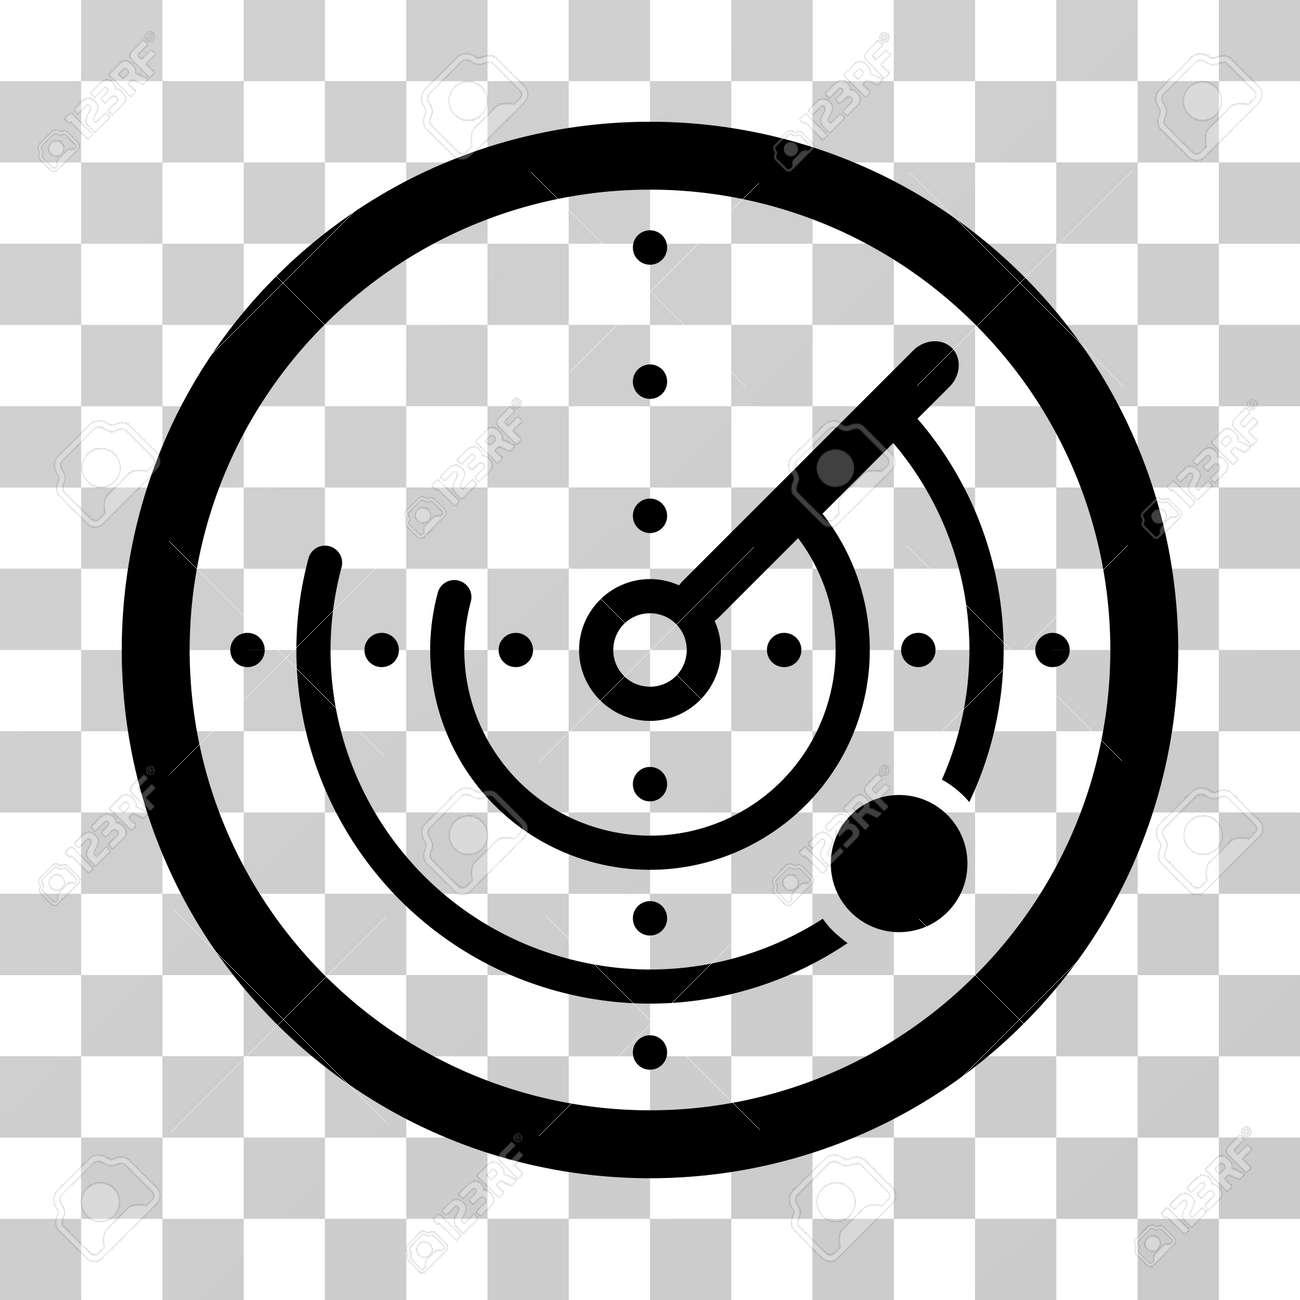 Radar Icon Vector Illustration Style Is Flat Iconic Symbol